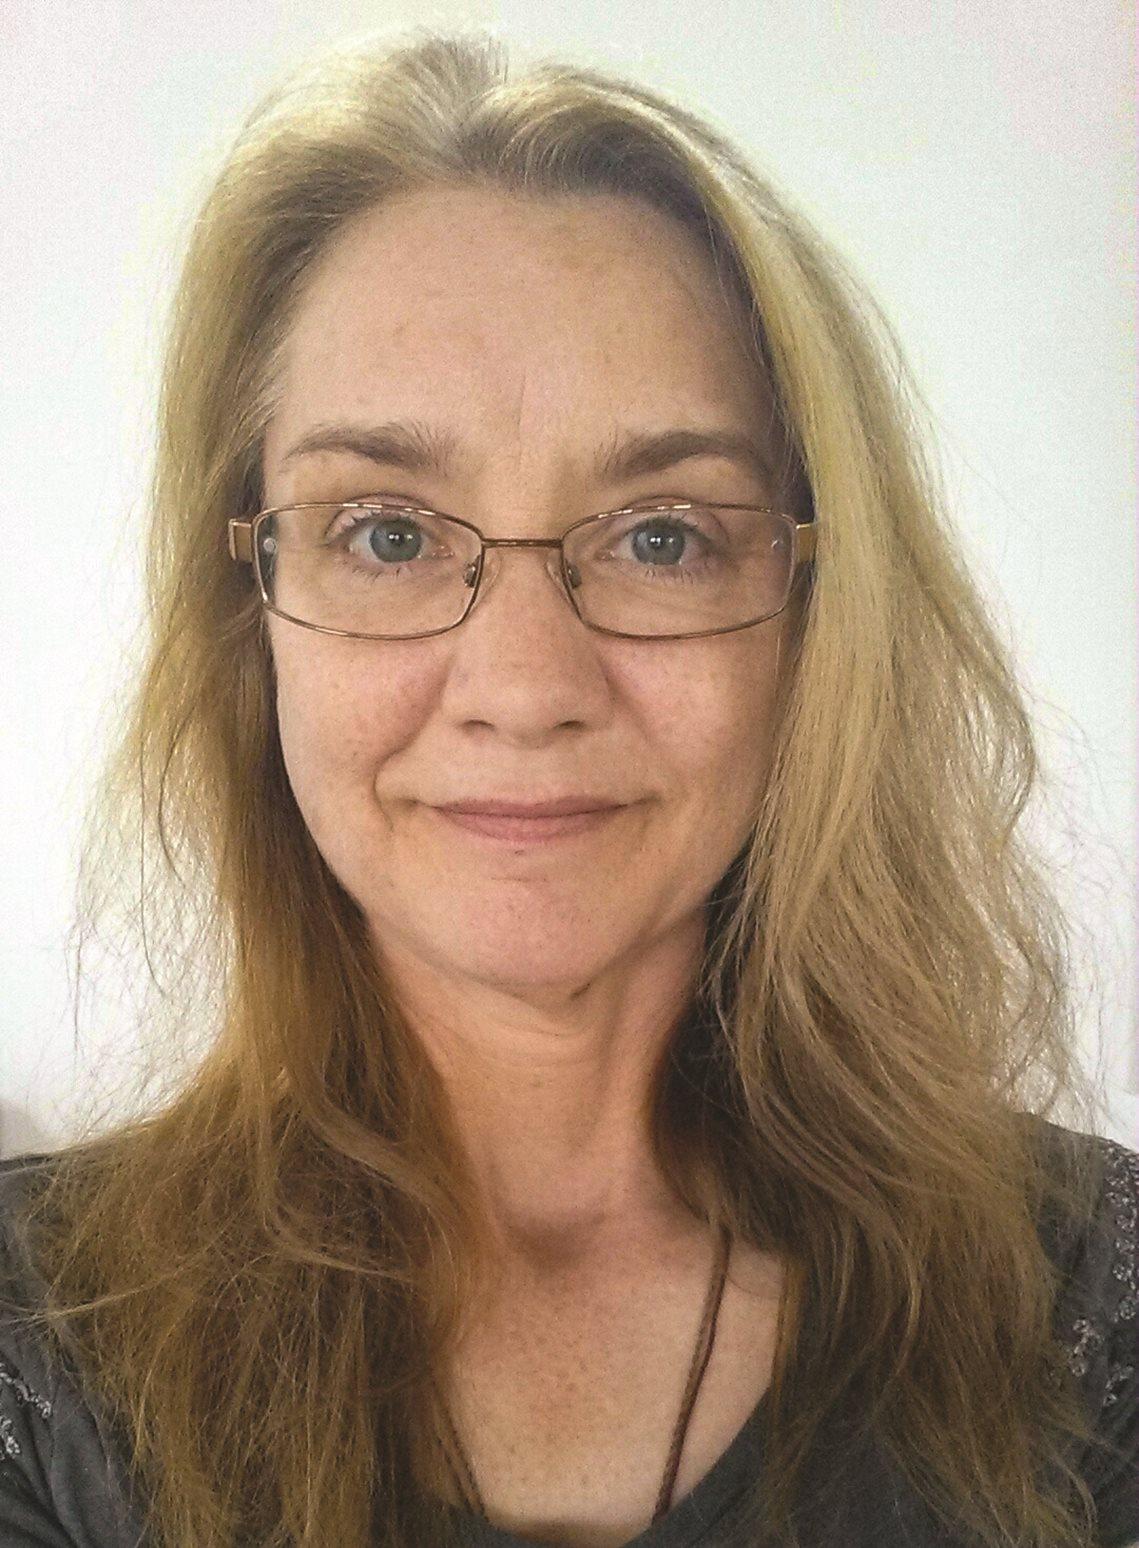 Pam Henson, Communications Associate